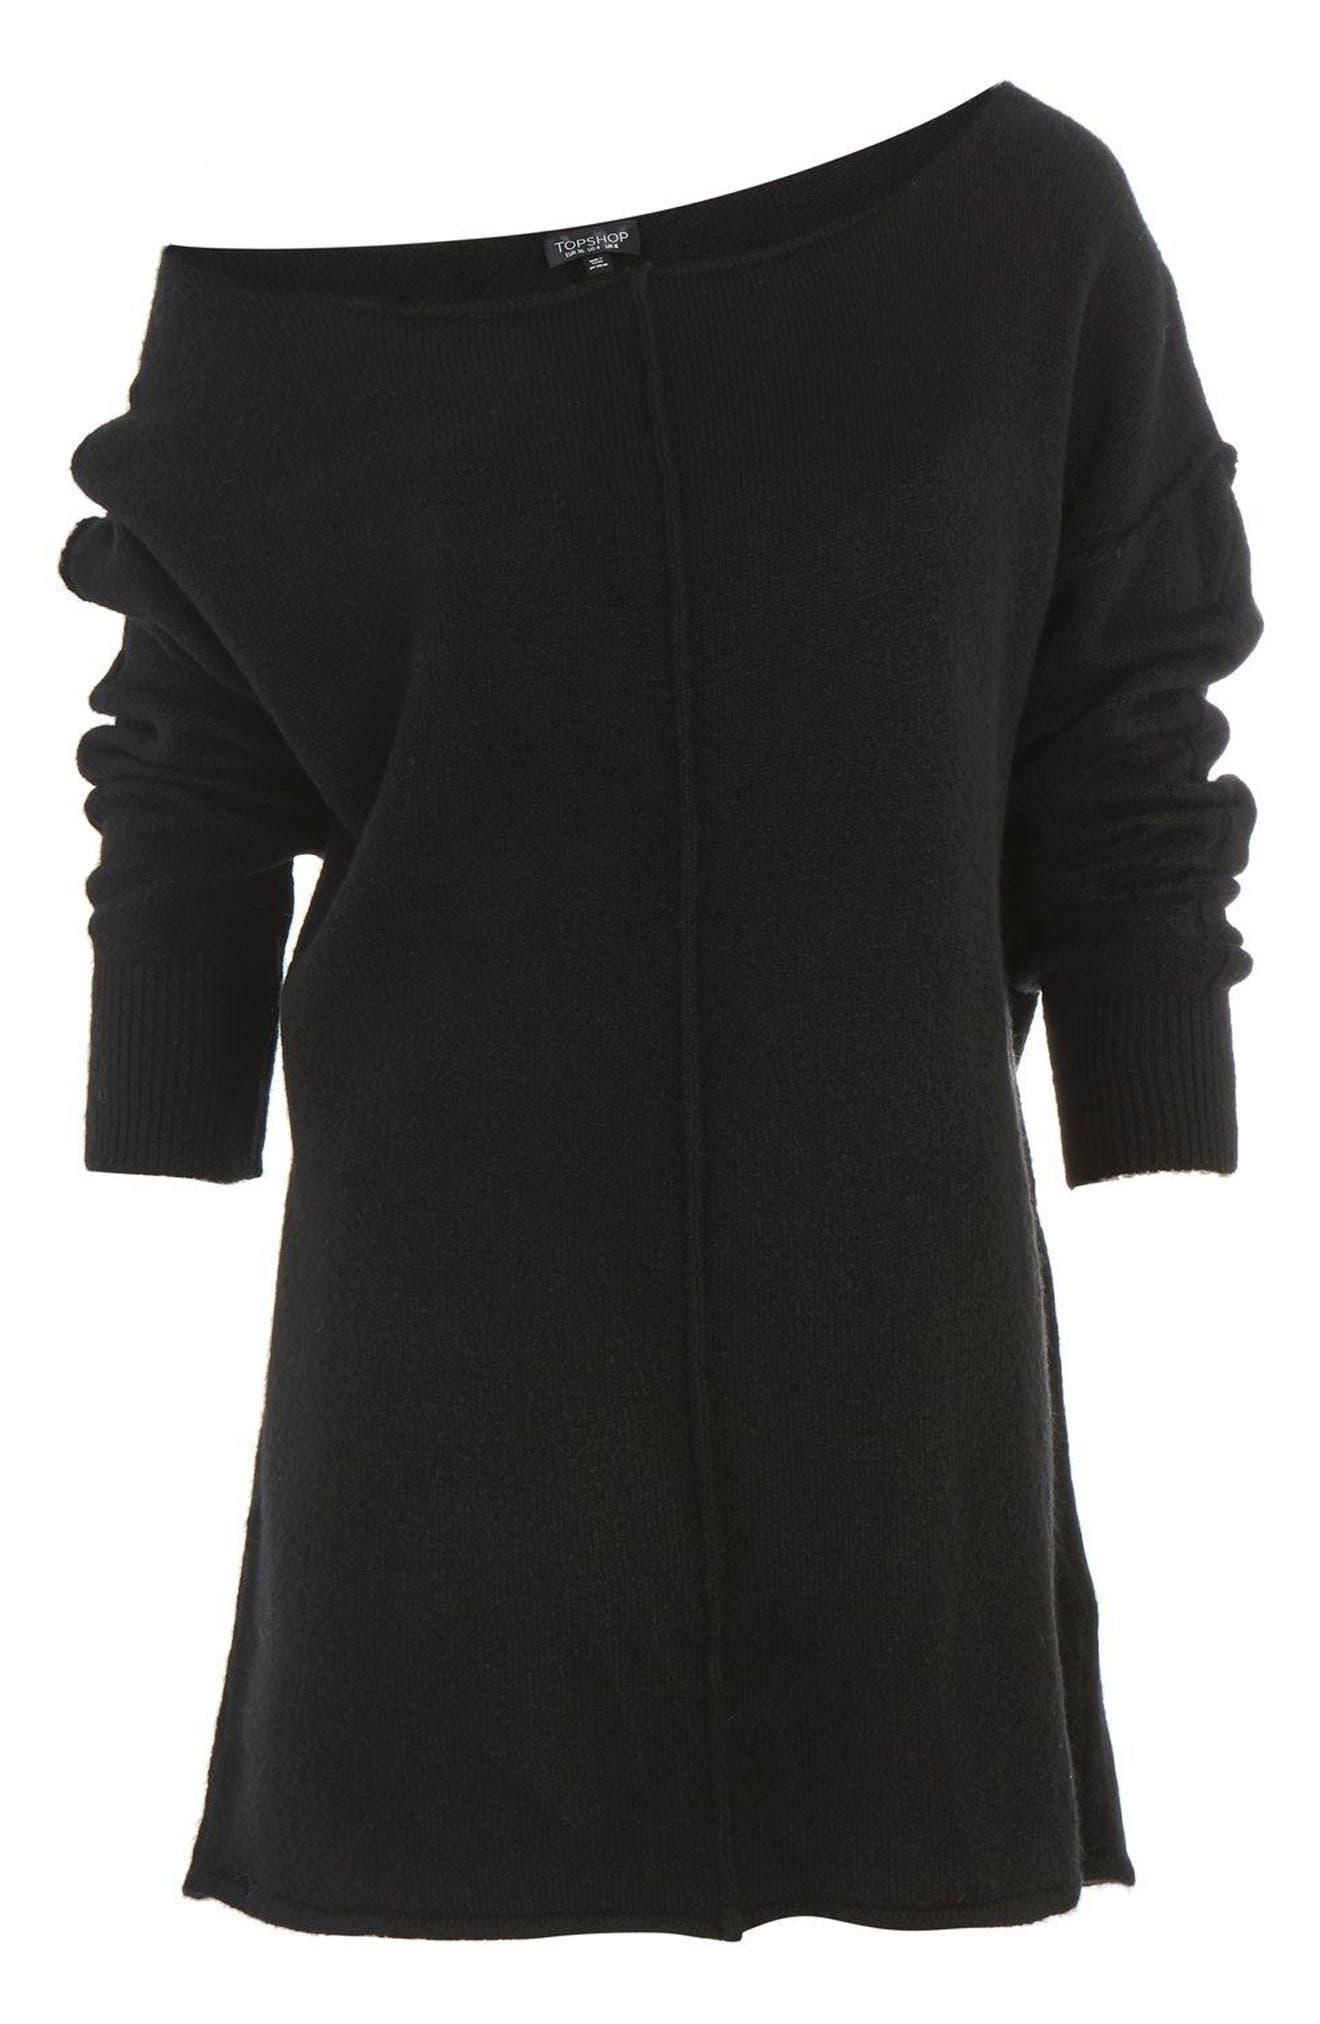 Exposed Seam Sweater,                             Alternate thumbnail 4, color,                             Black